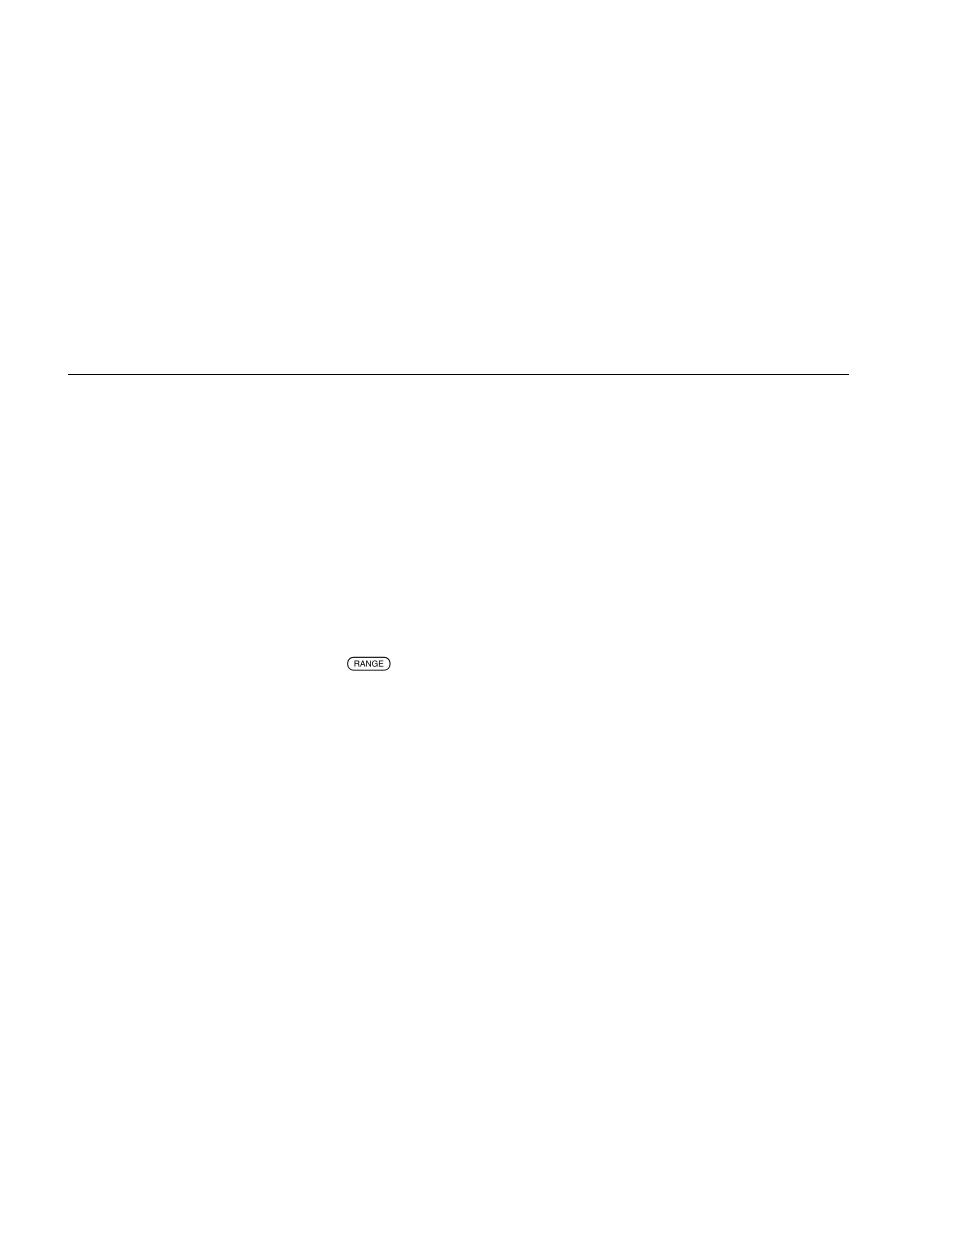 Measuring Capacitance Fluke 87 Iii User Manual Page 26 58 Testing A Capacitor In Circuit